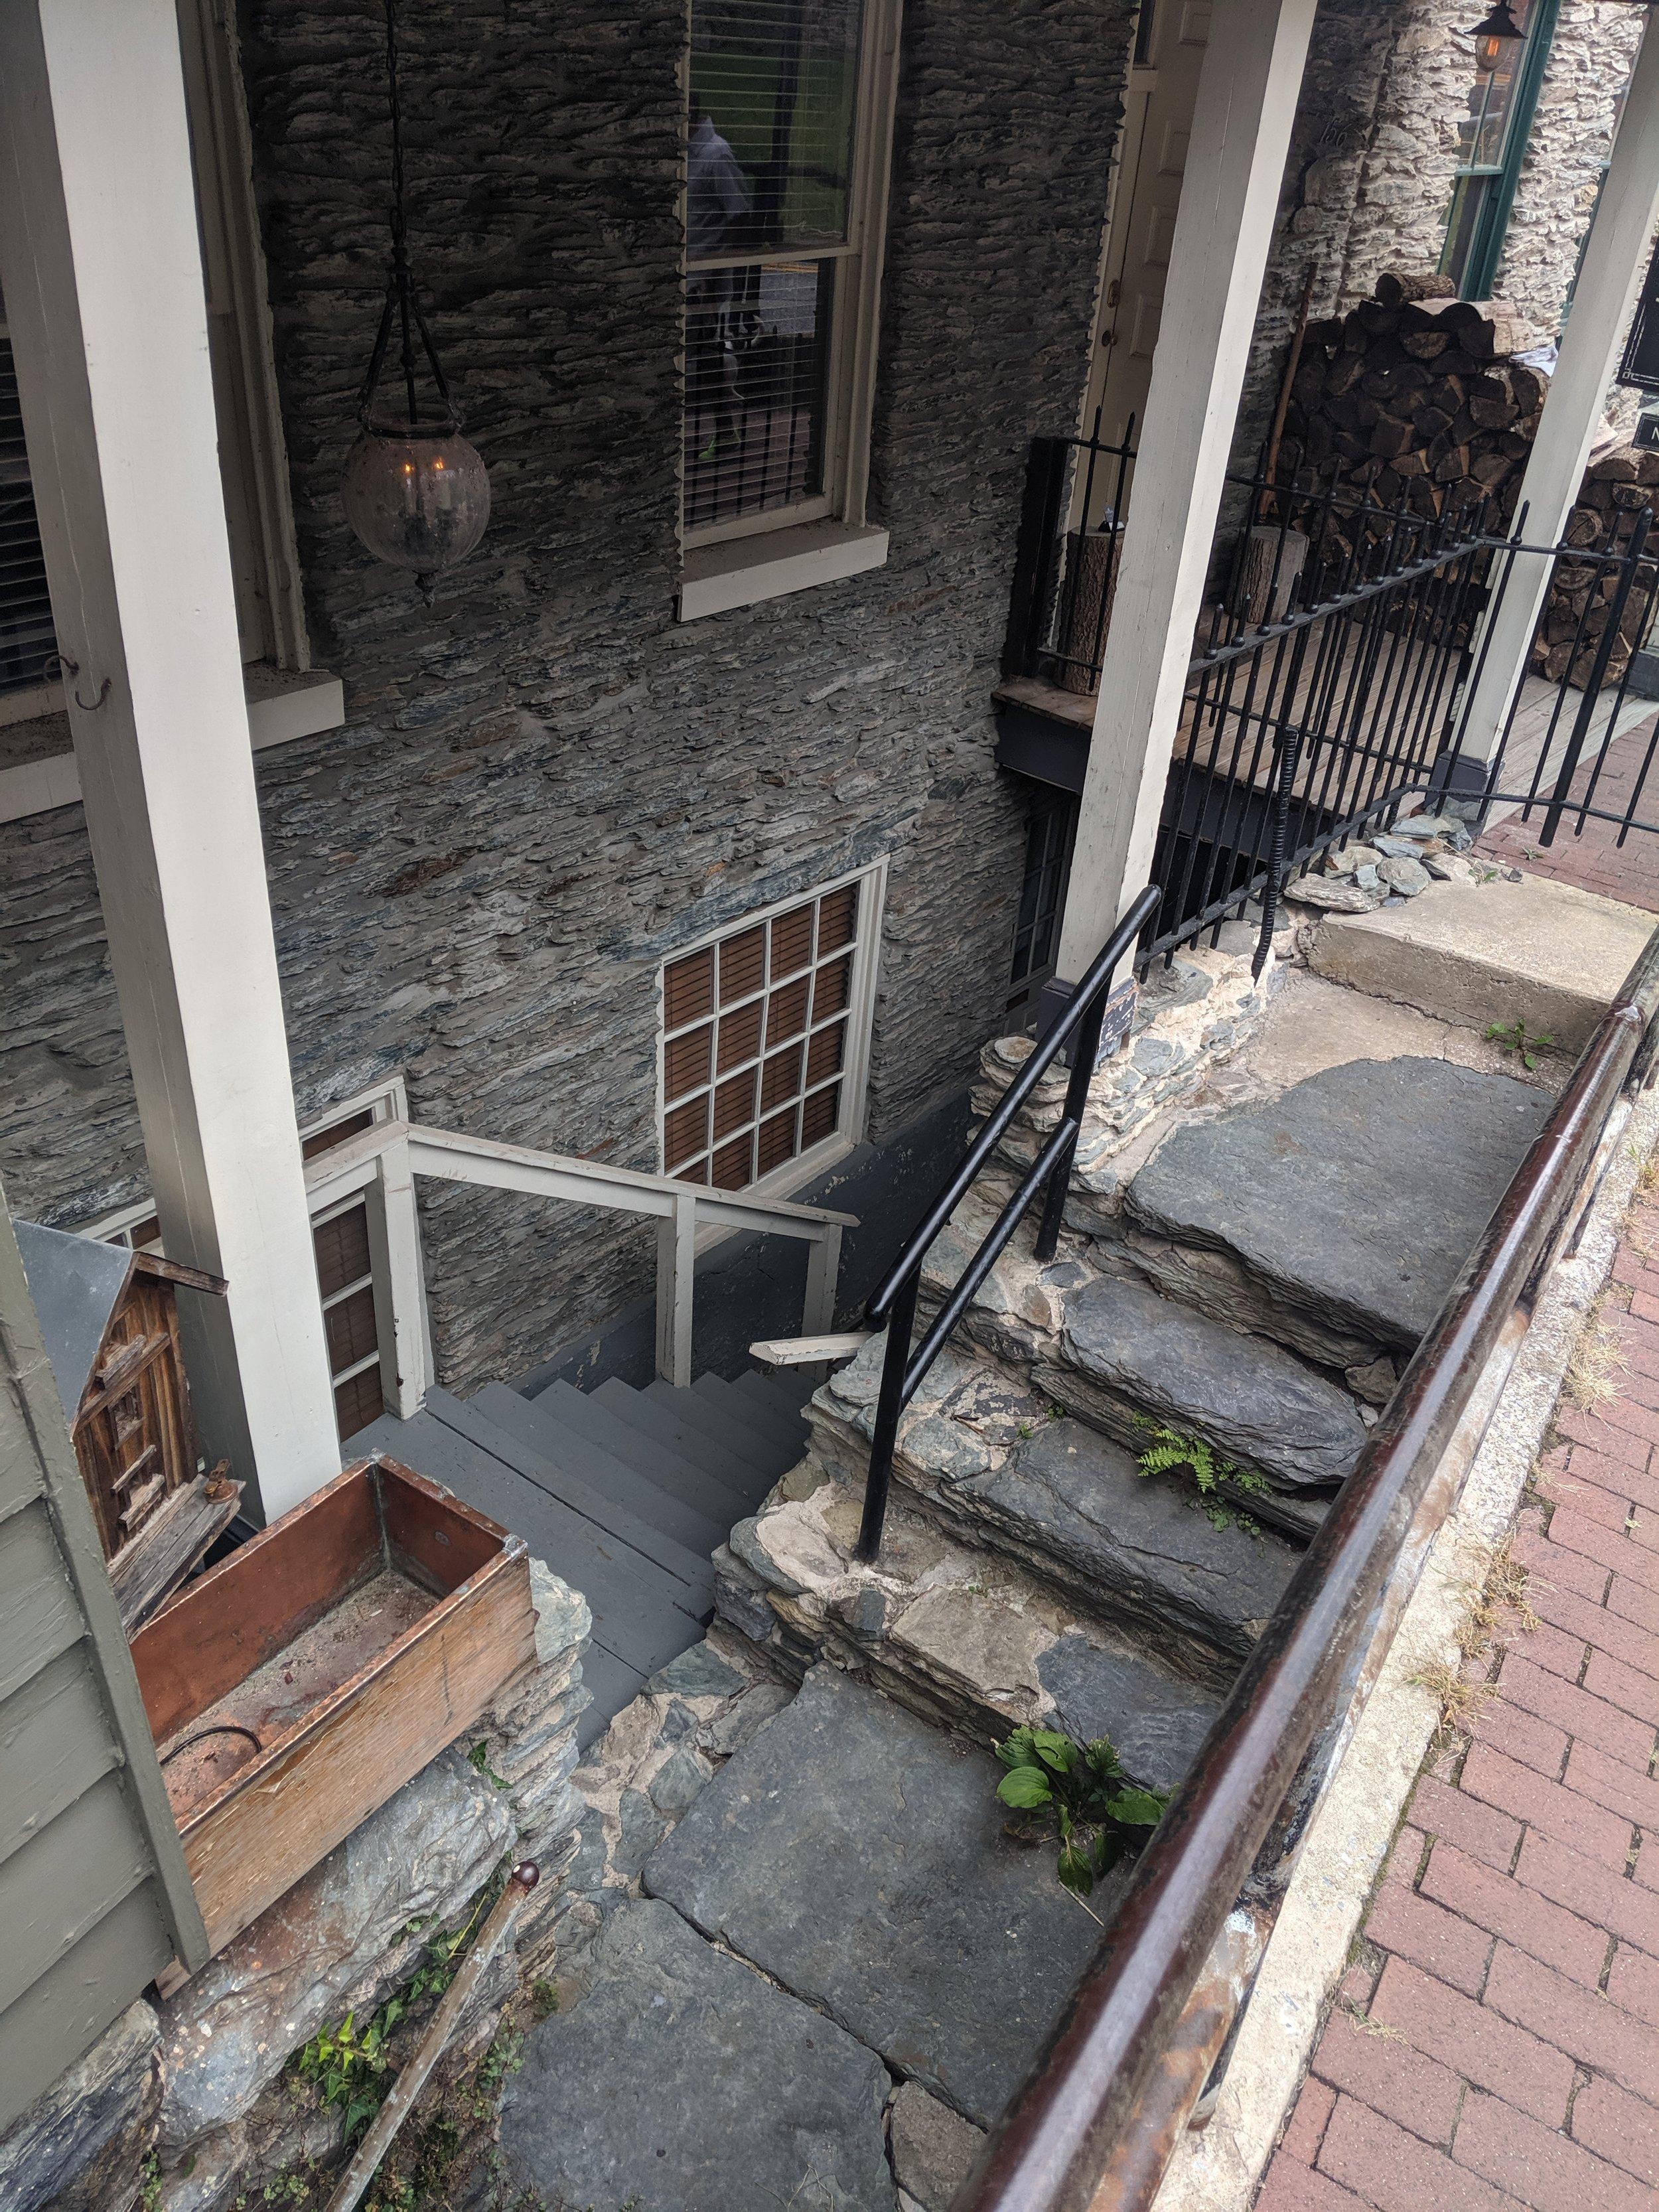 harpers ferry stairwell cobblestones.jpg